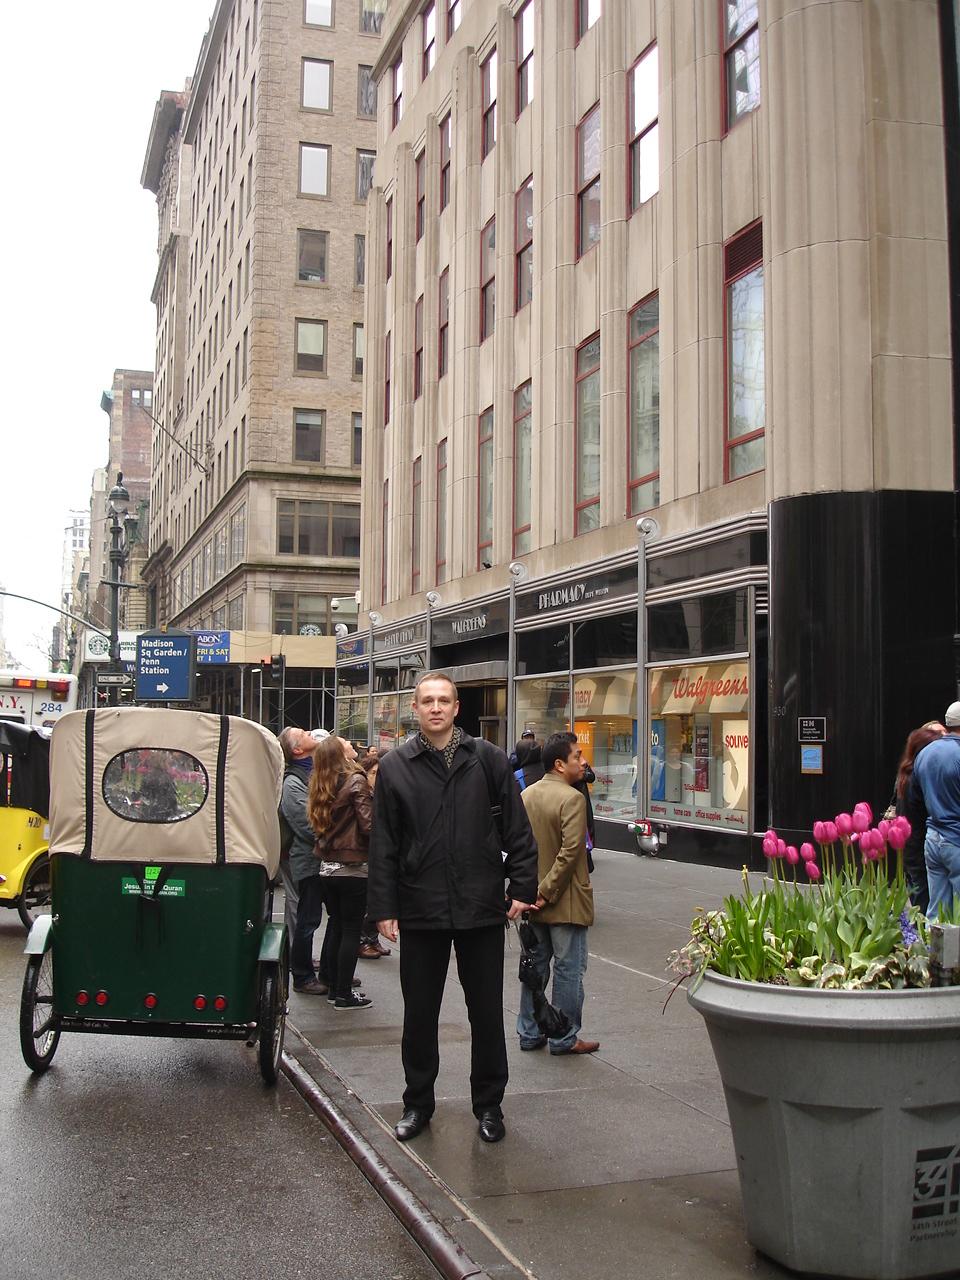 Нью-Йорк. На фоне Эмпайр-стейт-билдинг и повозки Алика